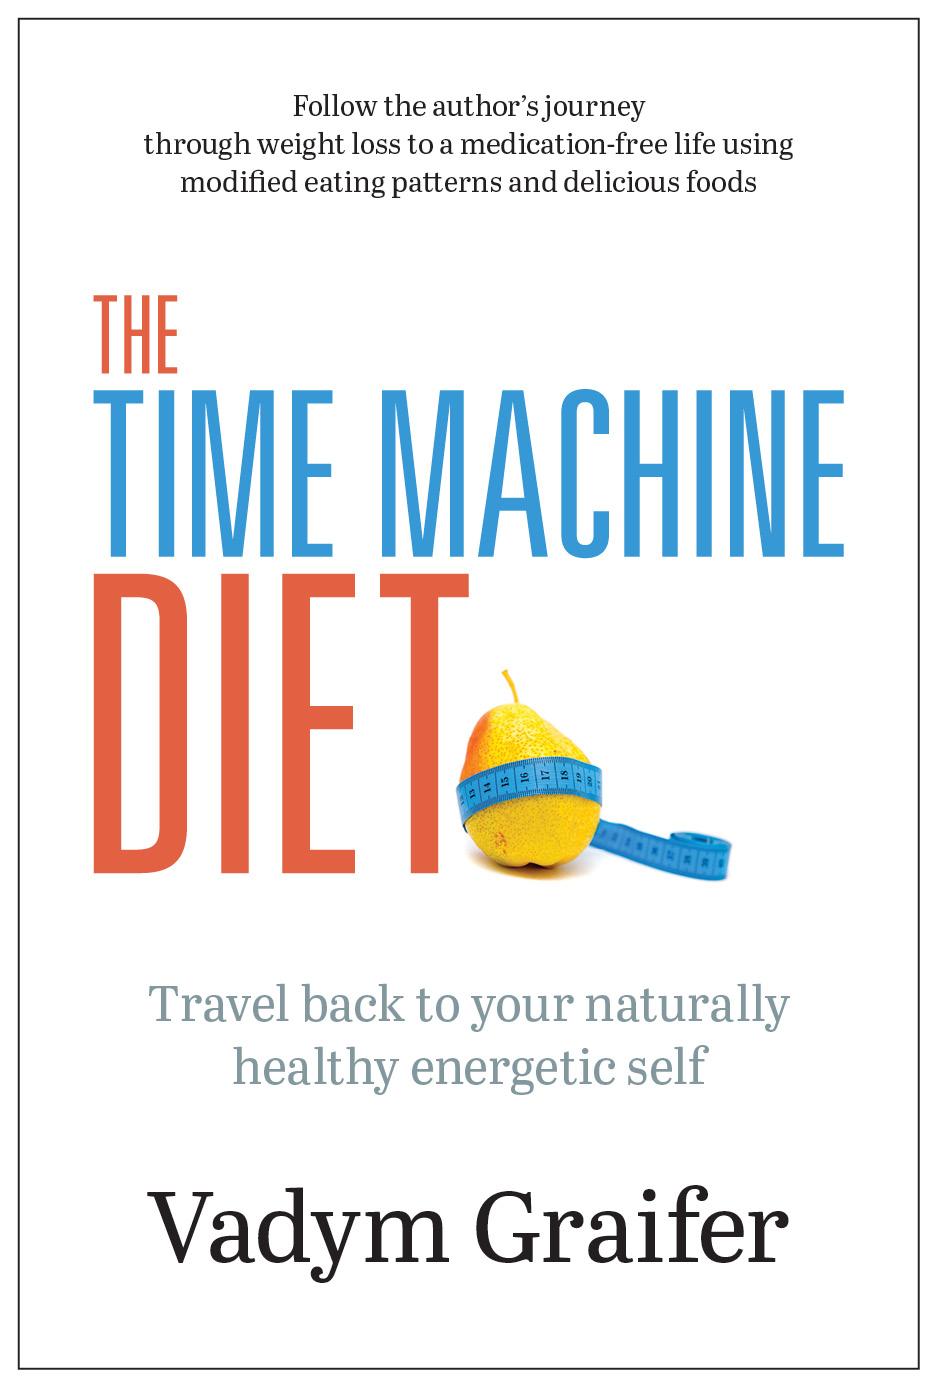 The Time Machine Diet Book